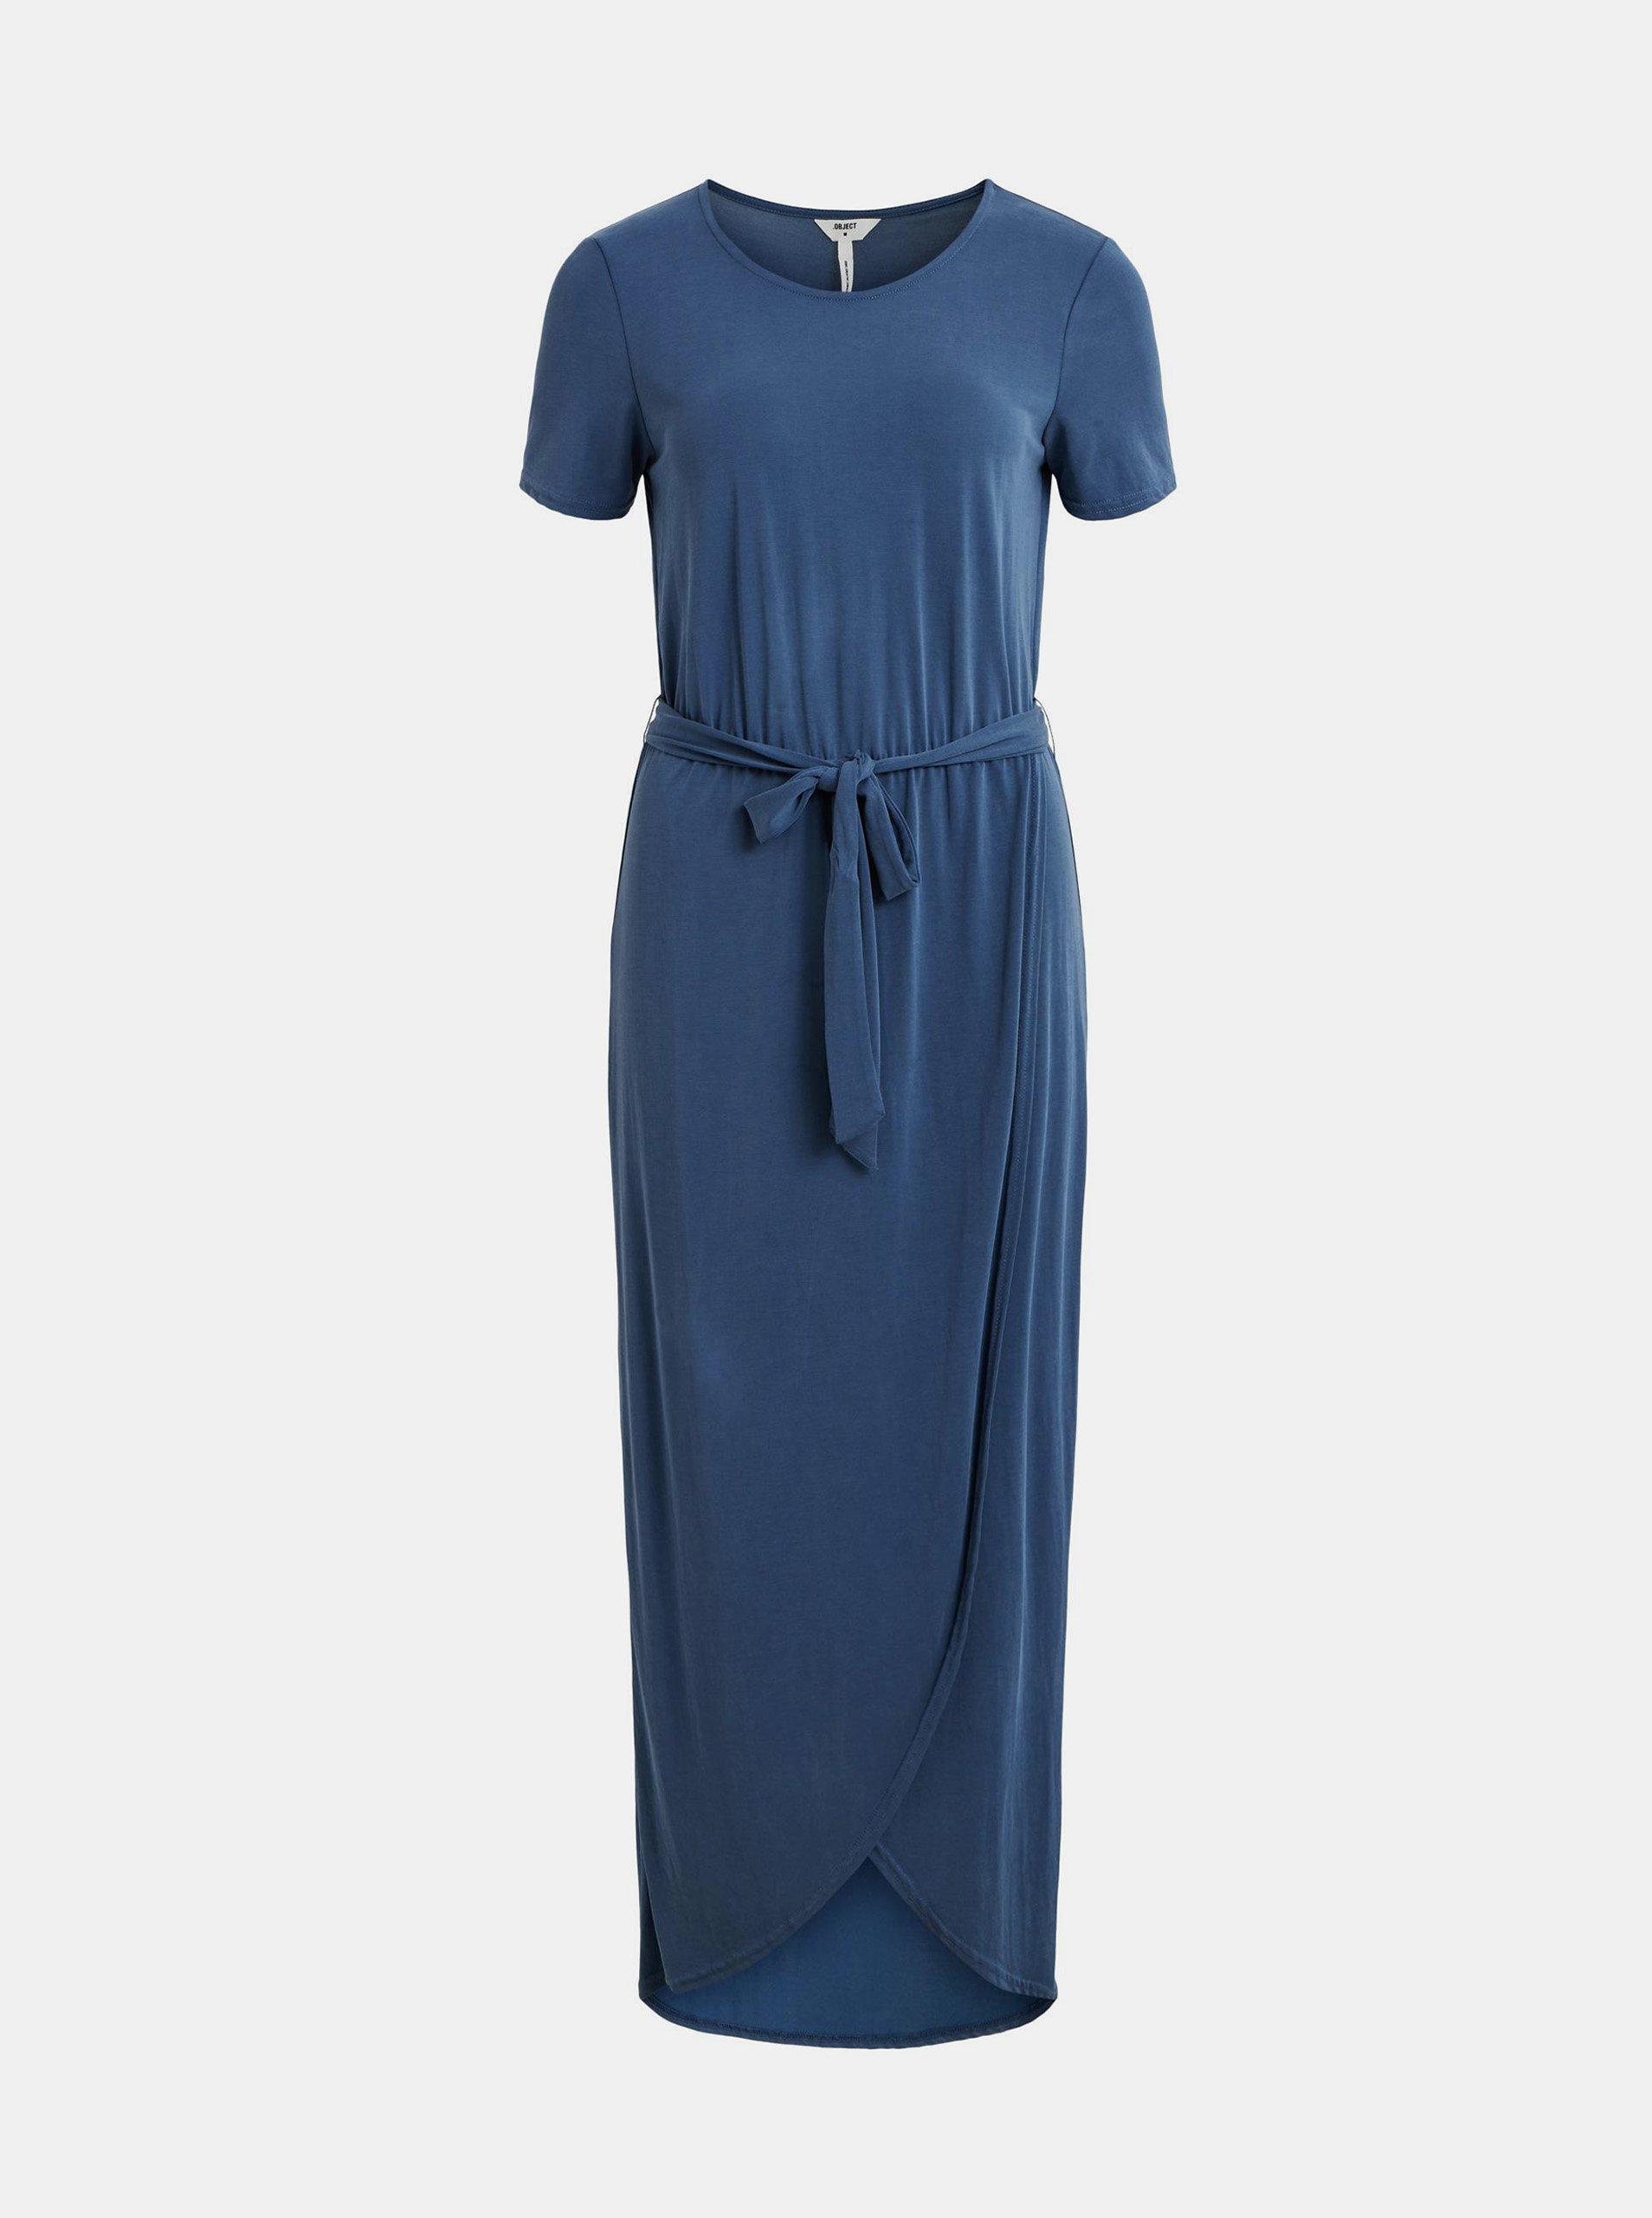 Letné a plážové šaty pre ženy .OBJECT - modrá.